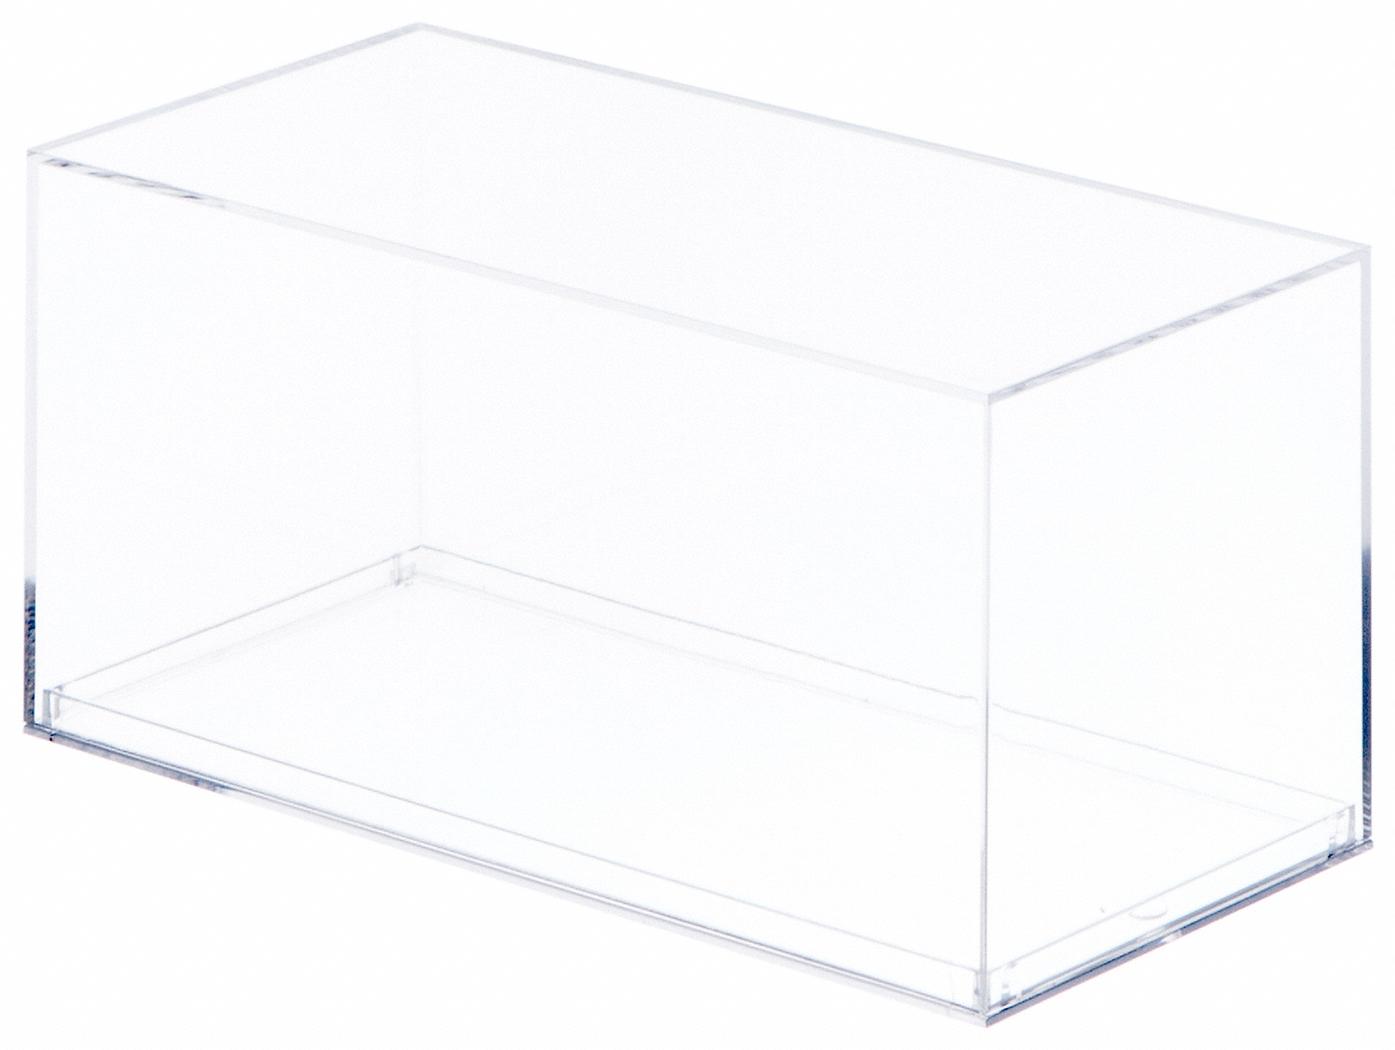 Pioneer Plastics Clear Acrylic Display Case with Beveled Edge 3.75 x 3.5 x 8